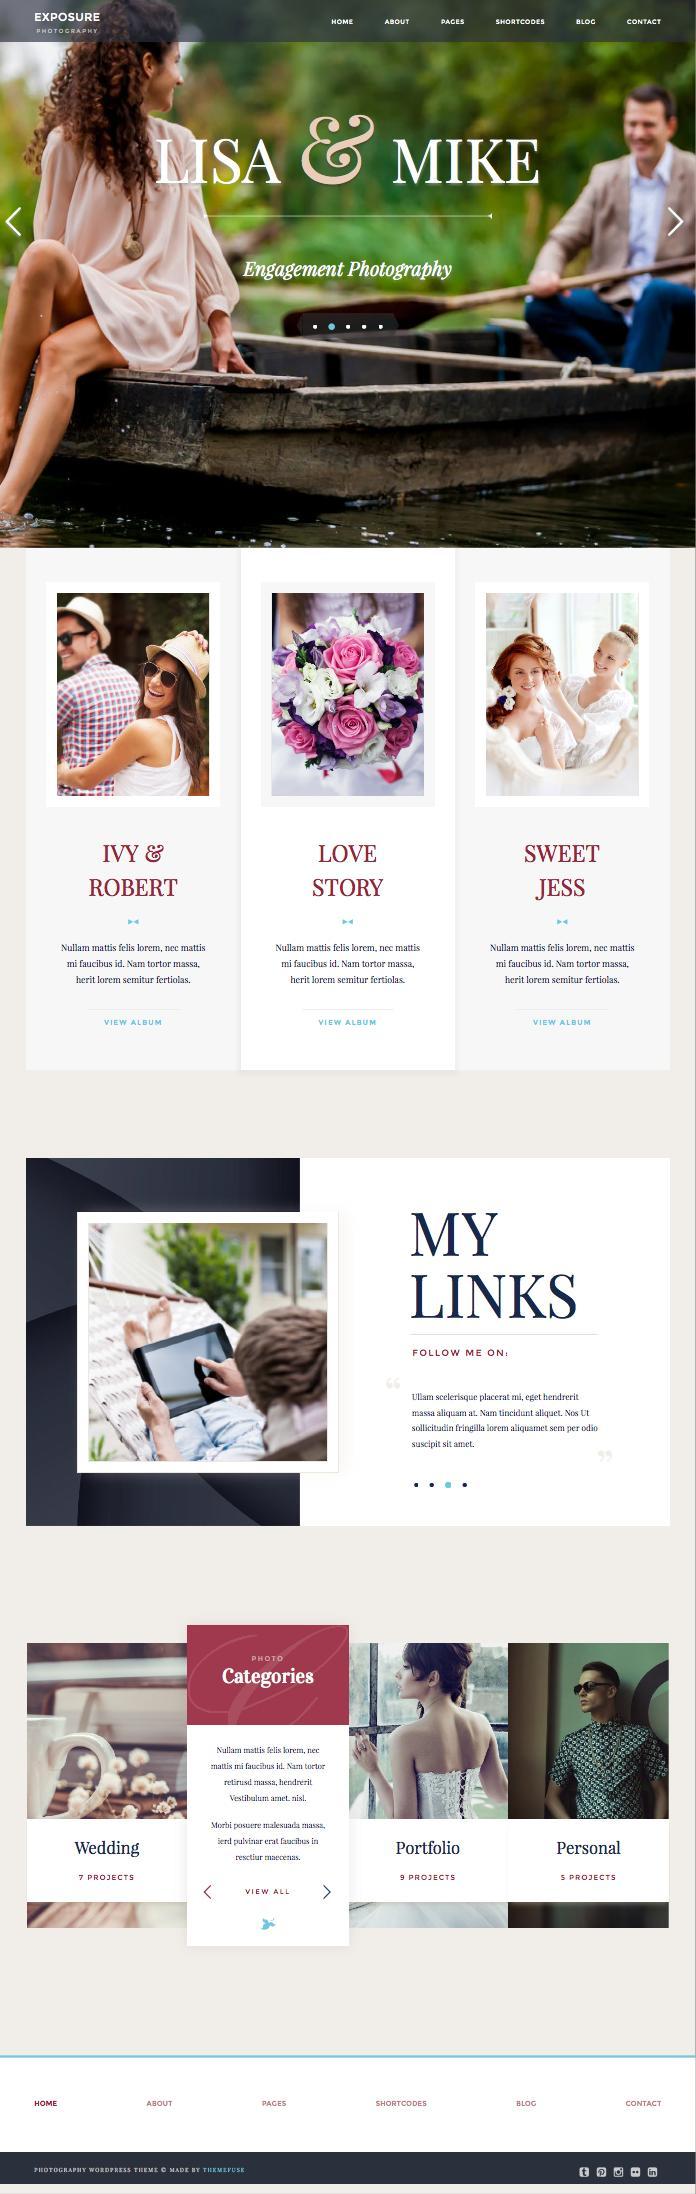 Exposure WordPress Professional Photographers Theme